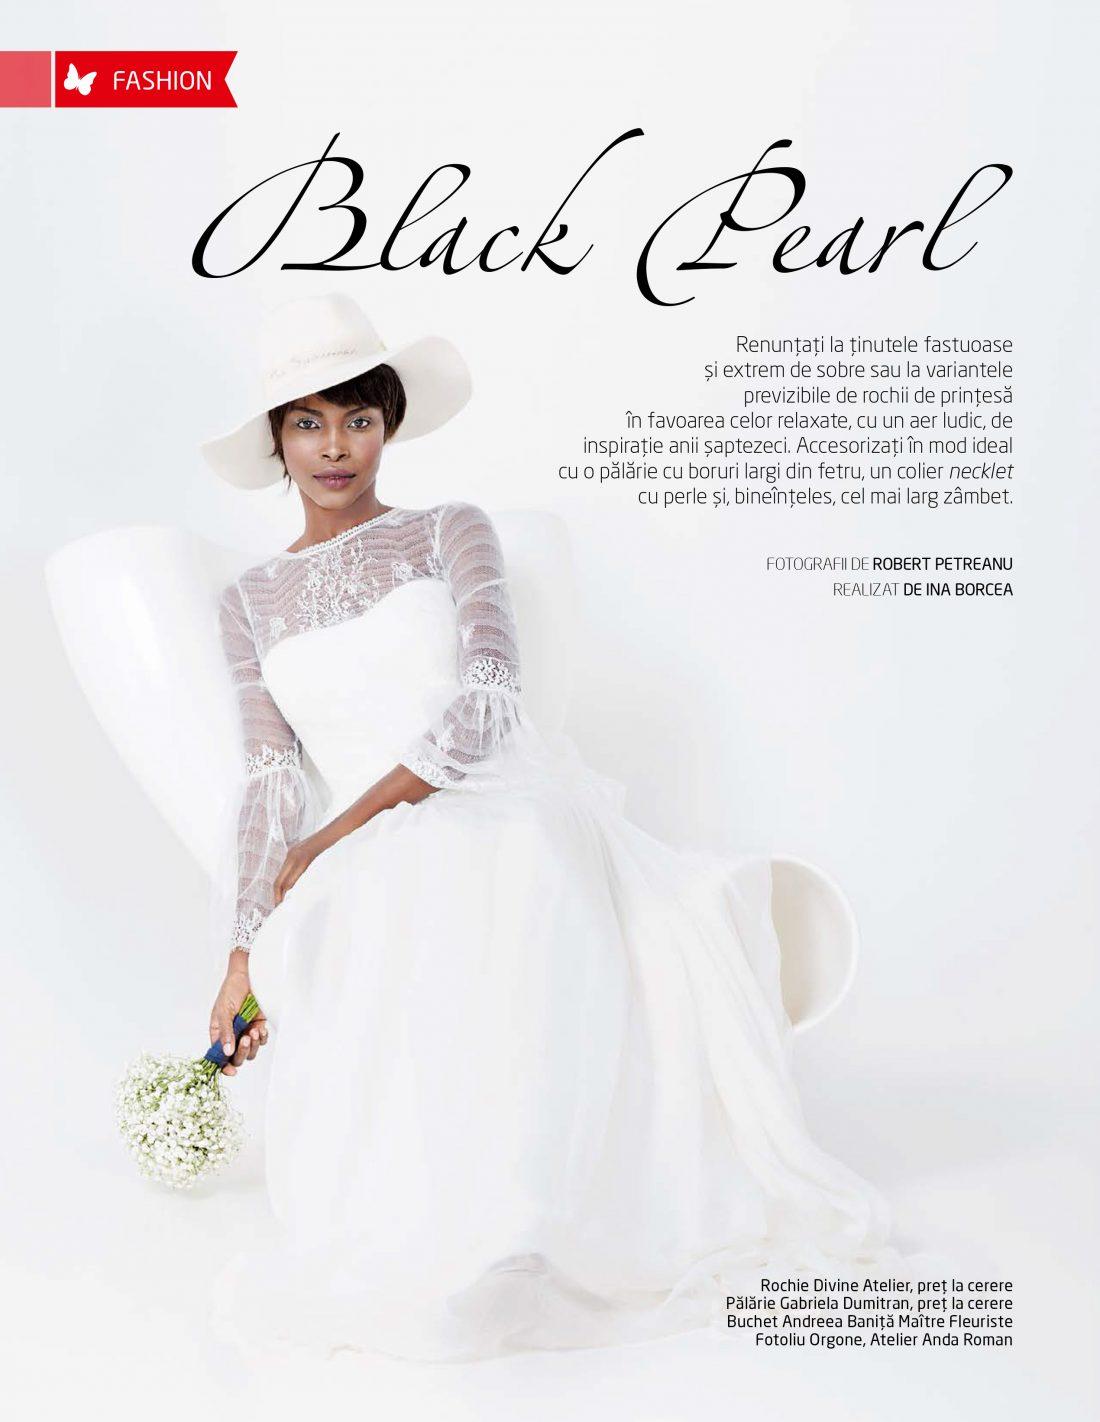 Beau Monde Mirese - Black Pearl | Tania Cozma makeup